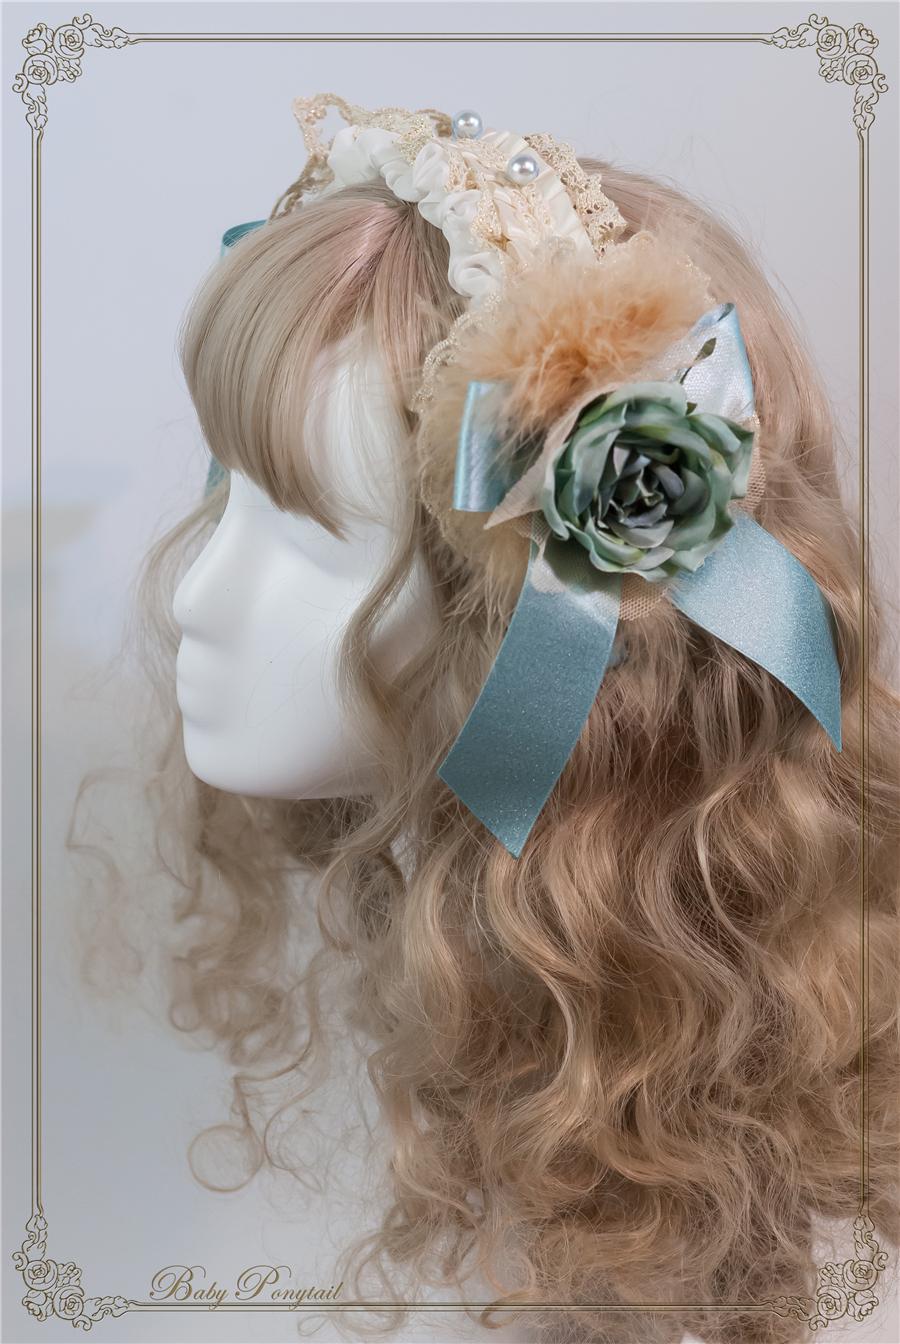 Baby Ponytail_Stock photo_Circus Princess_Rose Head Dress Sax_04.jpg